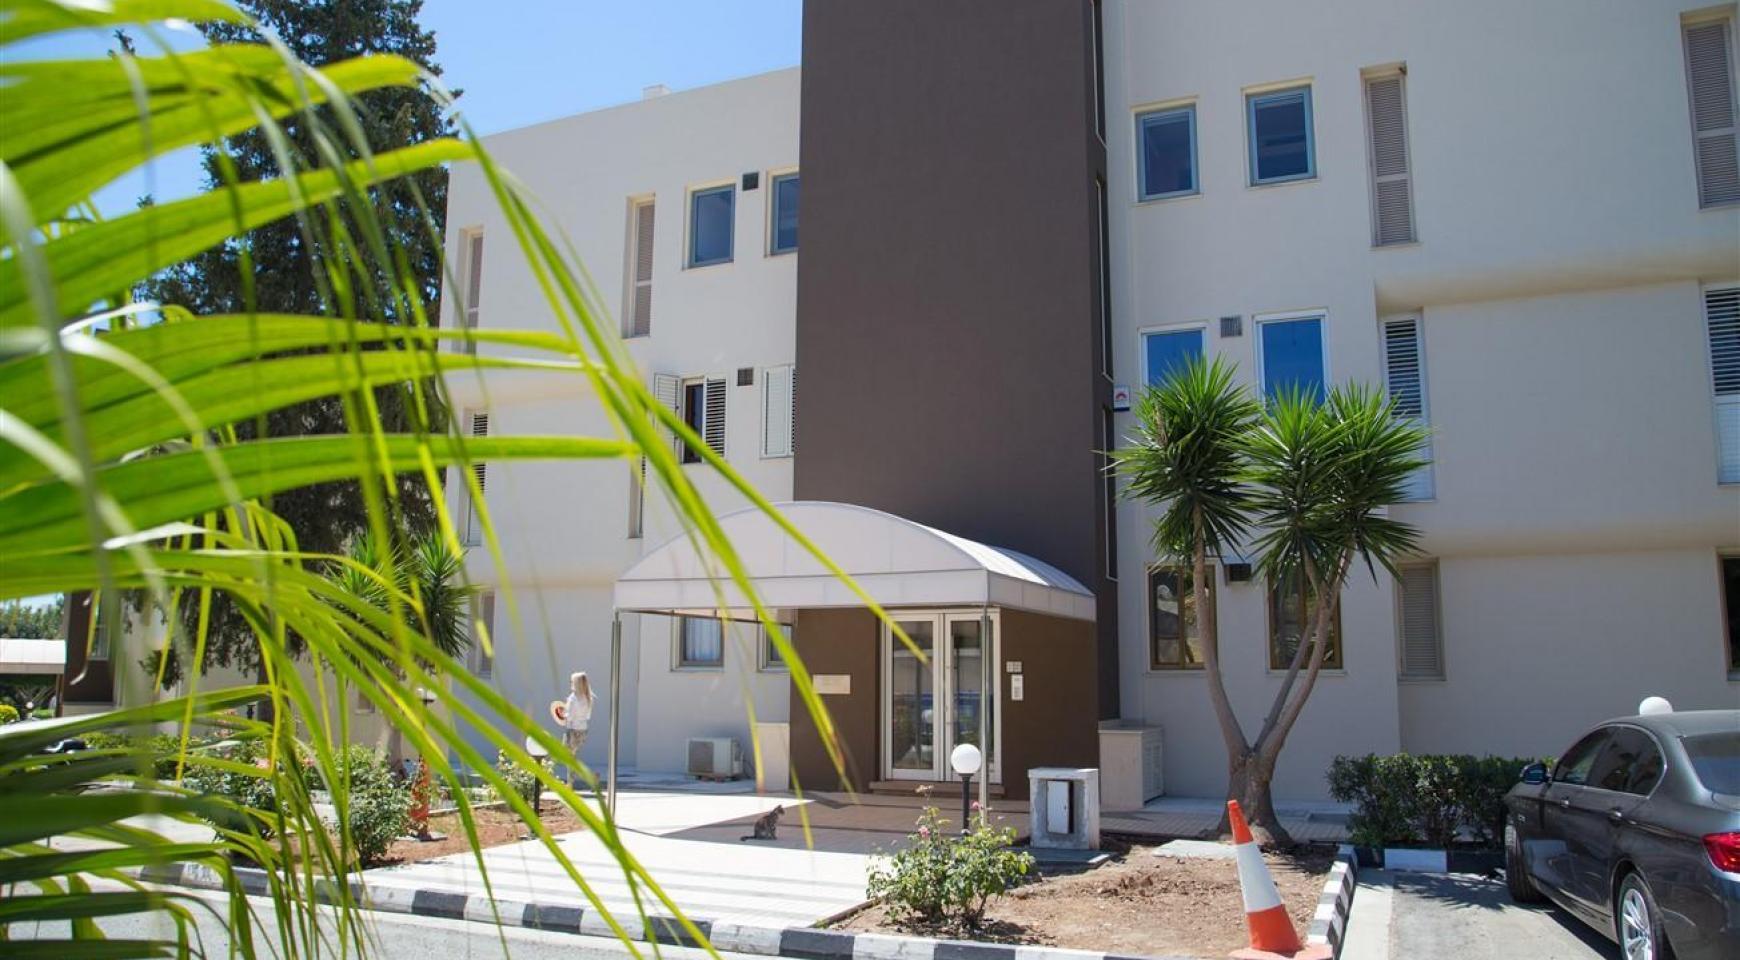 3-Спальная Квартира на Берегу Моря в Комплексе Thera   - 4